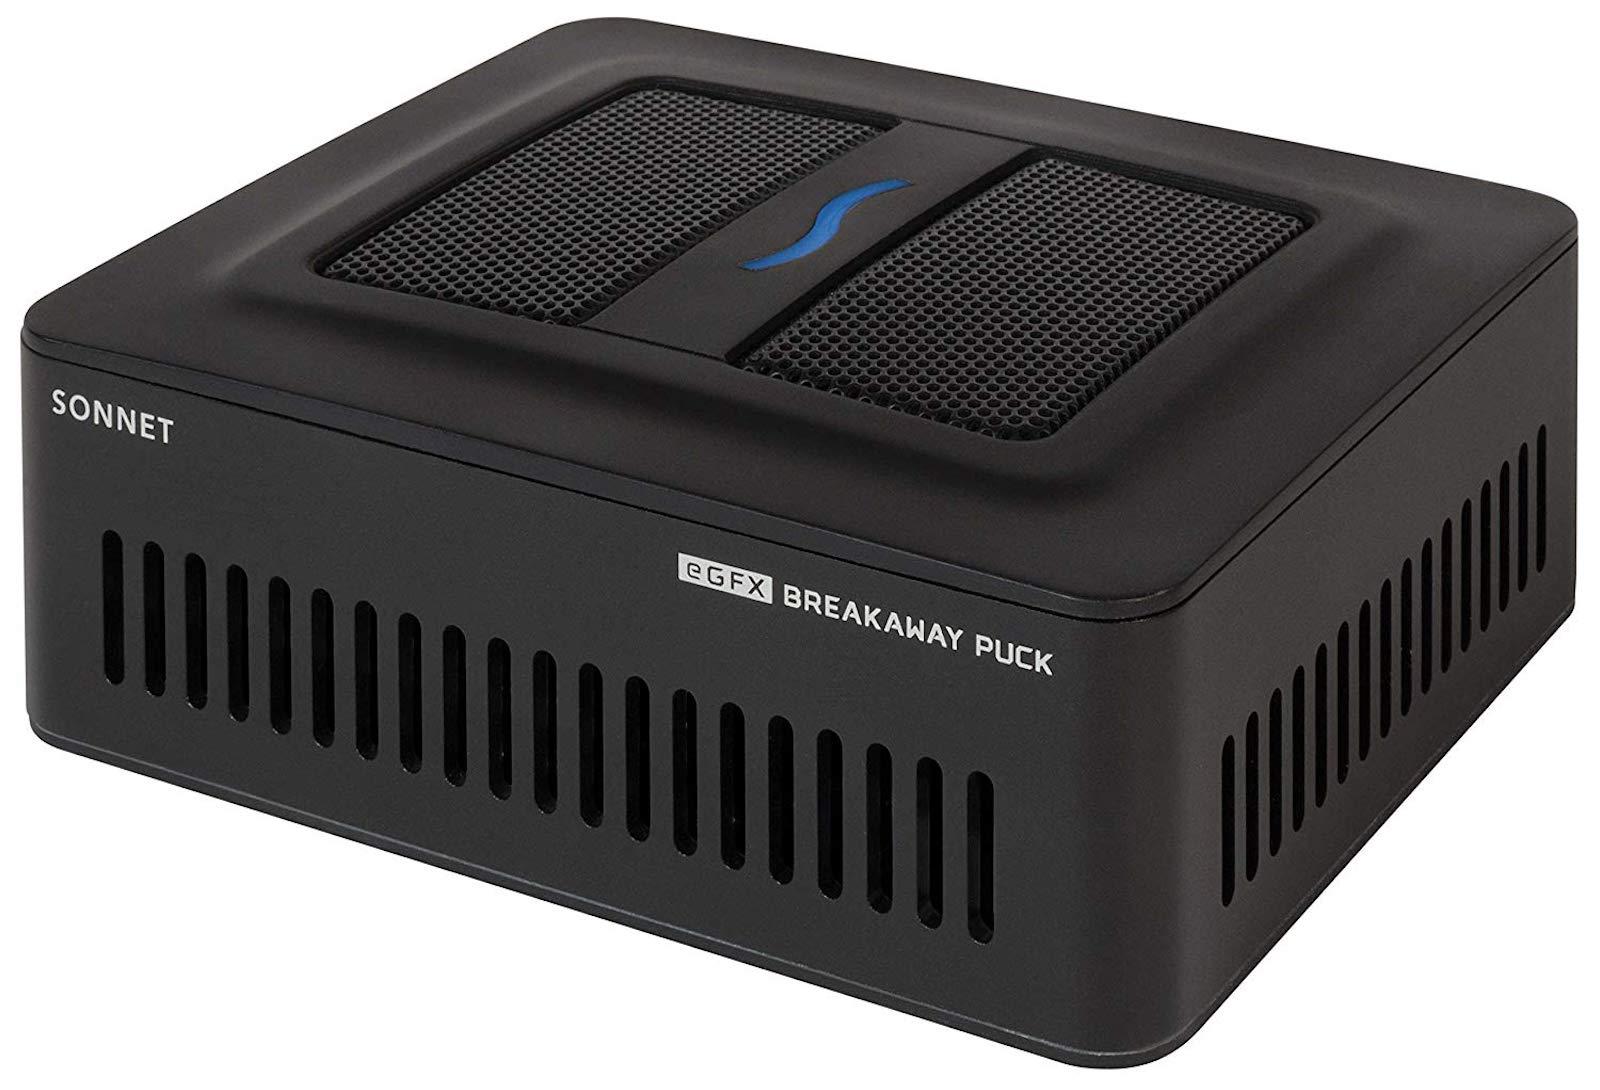 Sonnet-Radeon-RX-560-eGFX-Breakaway-Puck.jpg